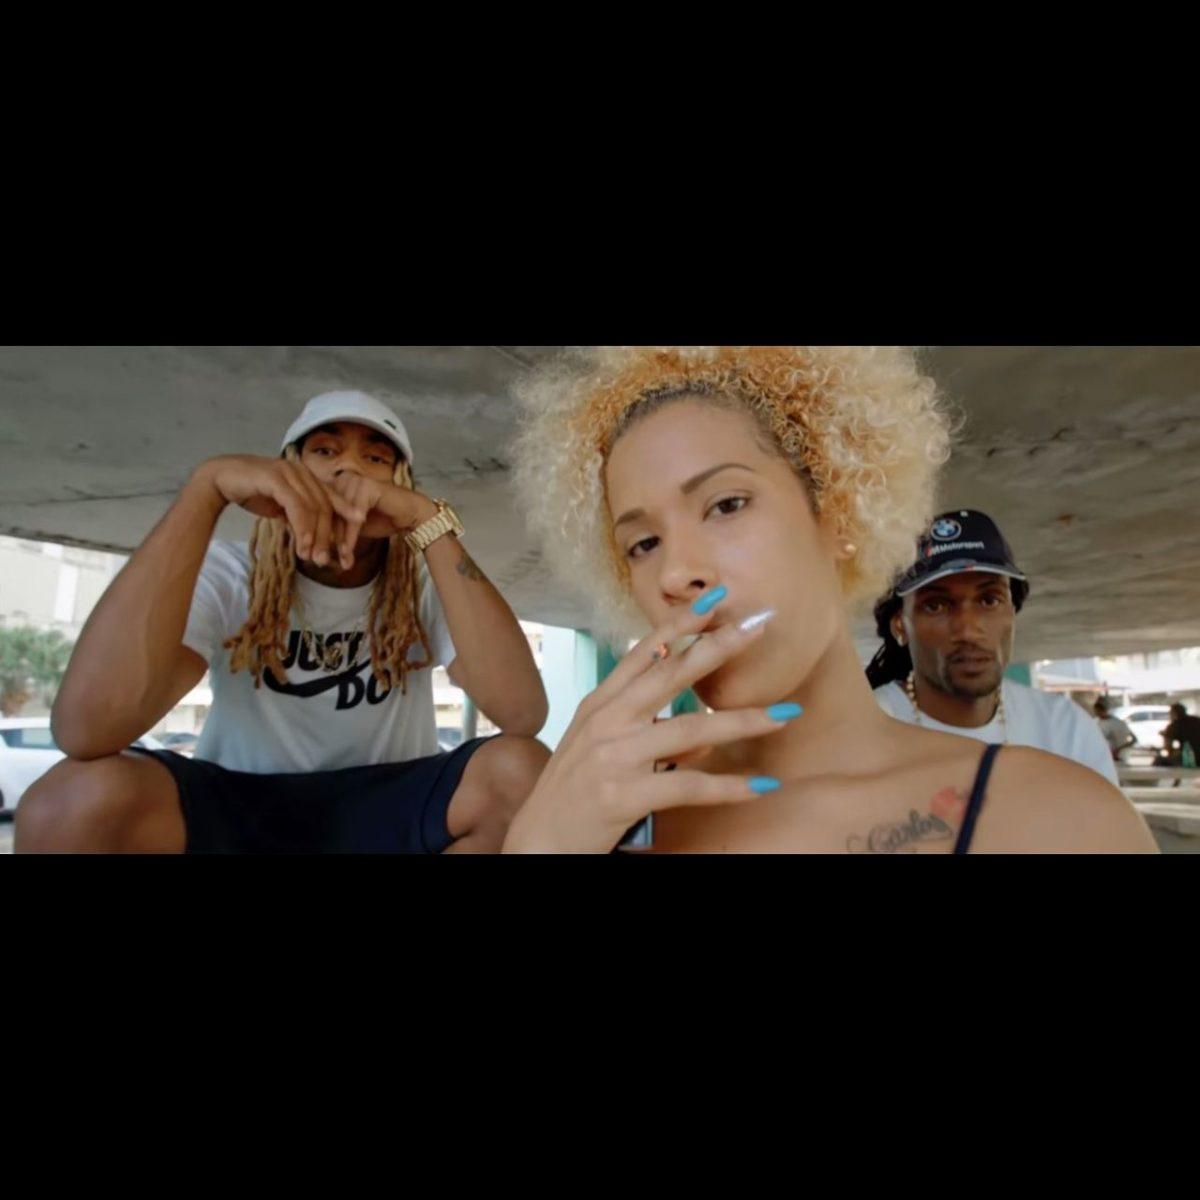 VJ Ben - Chiré (ft. Lyrrix and Don Snoop) (Thumbnail)